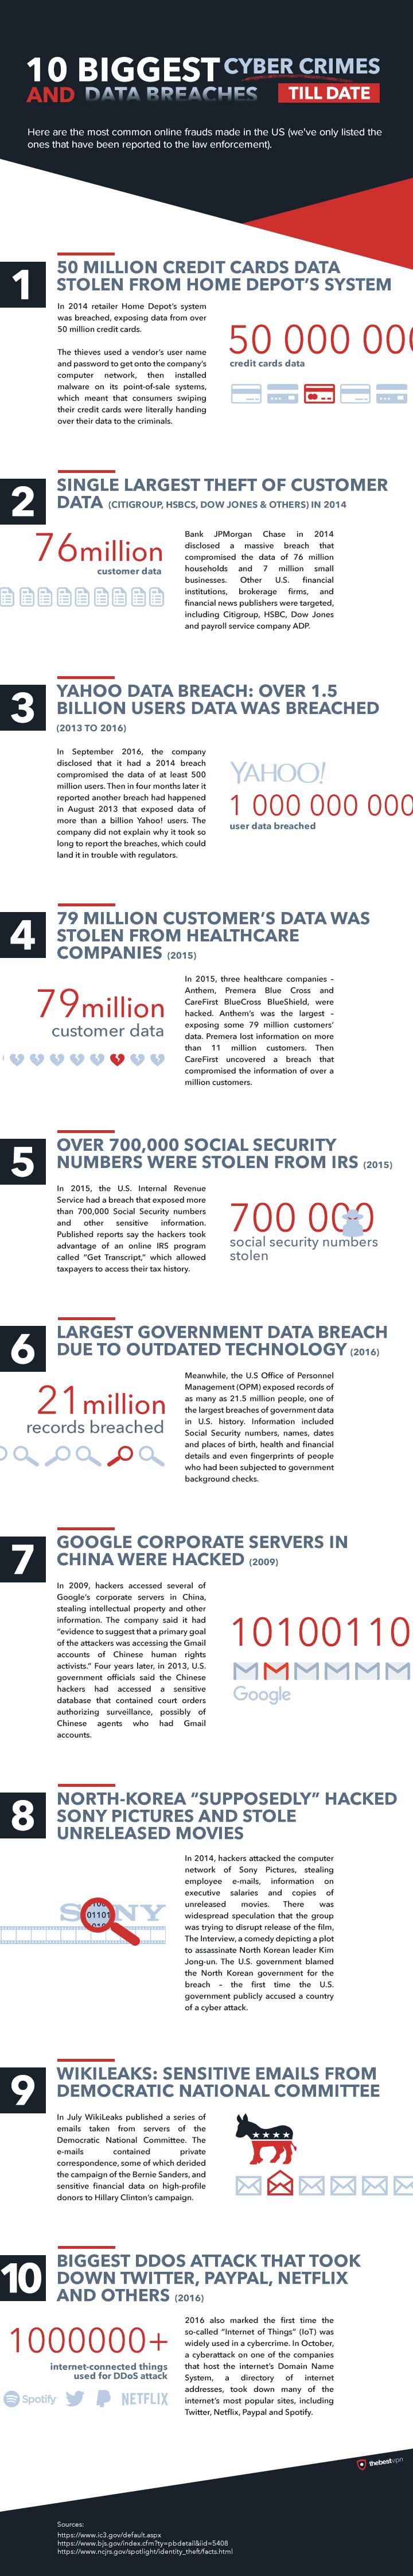 10-Biggest-Cyber-Crimes-and-Data-Breaches-1fbe0978324f4b9ba4ebda45bf91475c010600b0